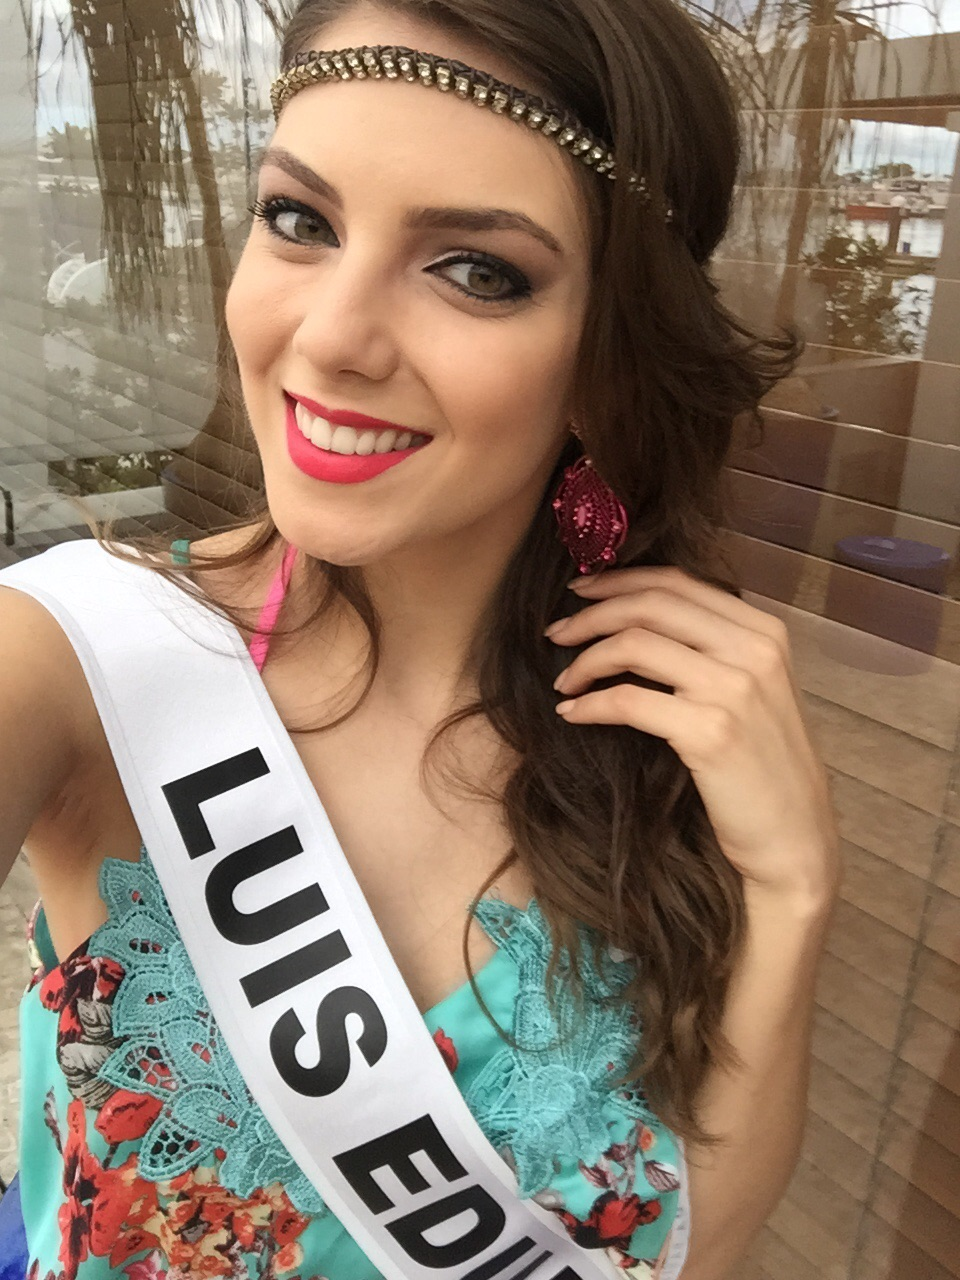 patricia guerra, miss brasil latina 2014. 7bxpec9m